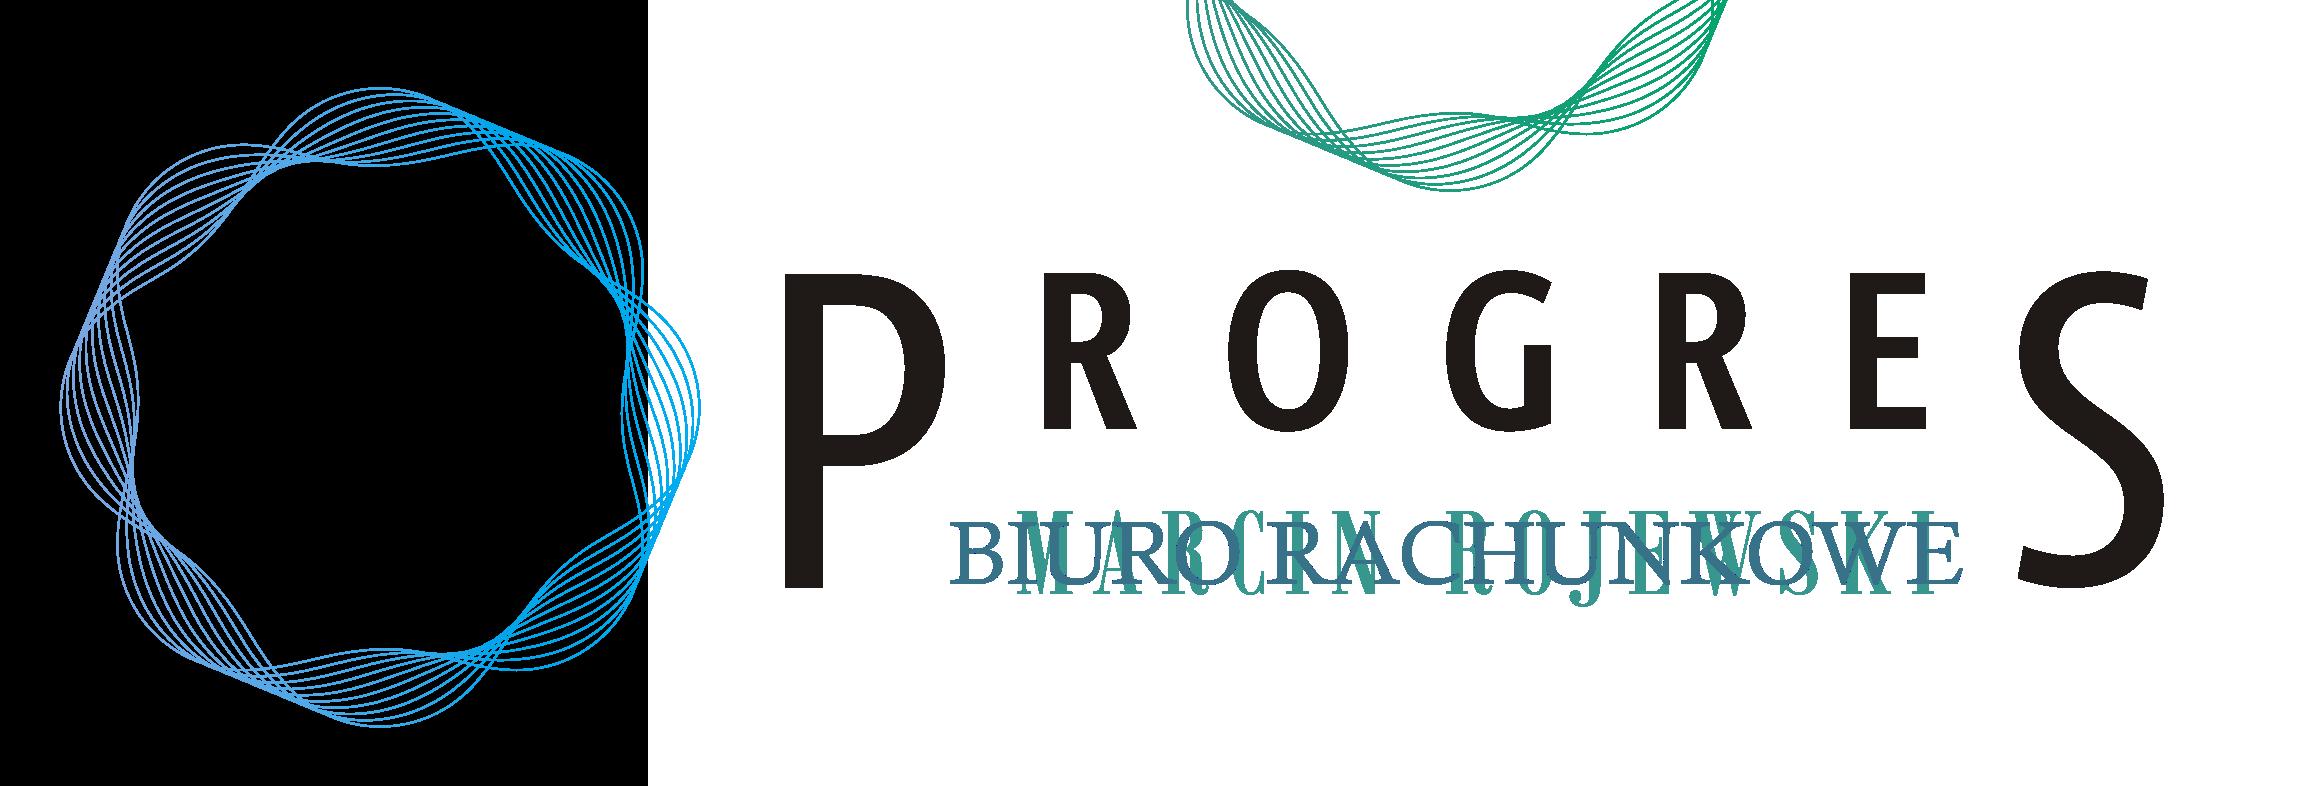 LOGO PROGRES-1-3(2)